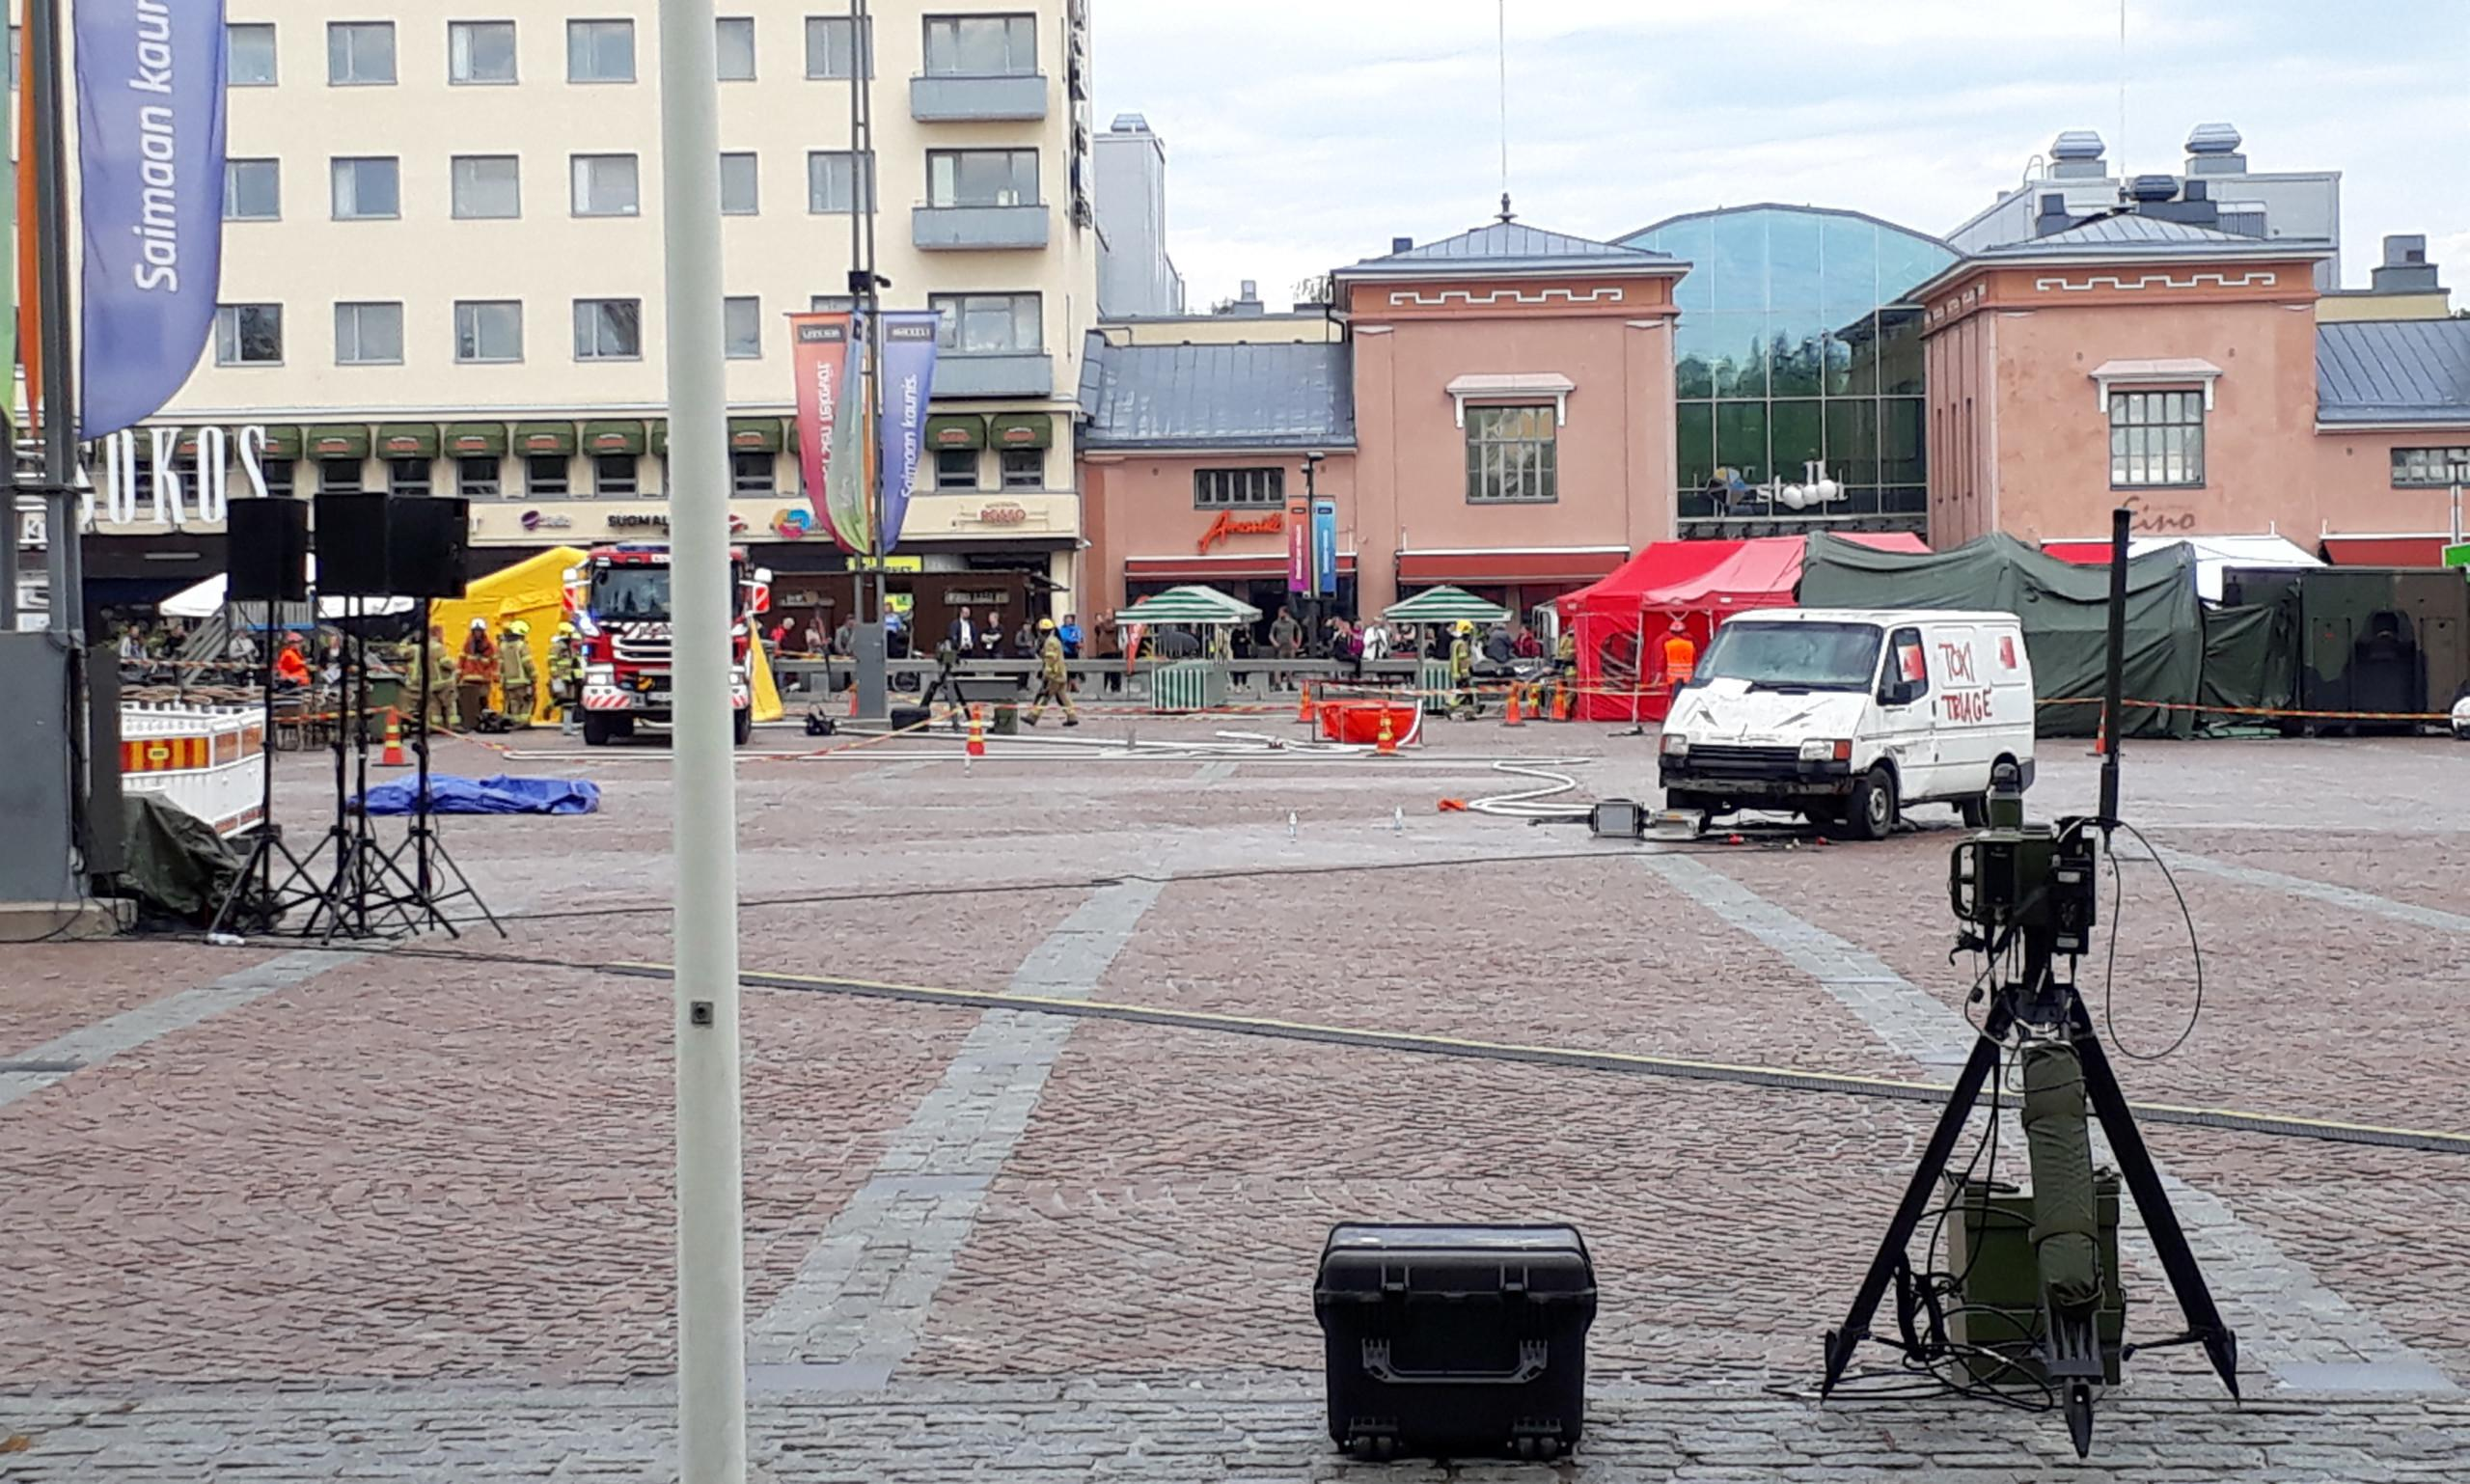 MPE as toxi triage in Mikkeli, finland